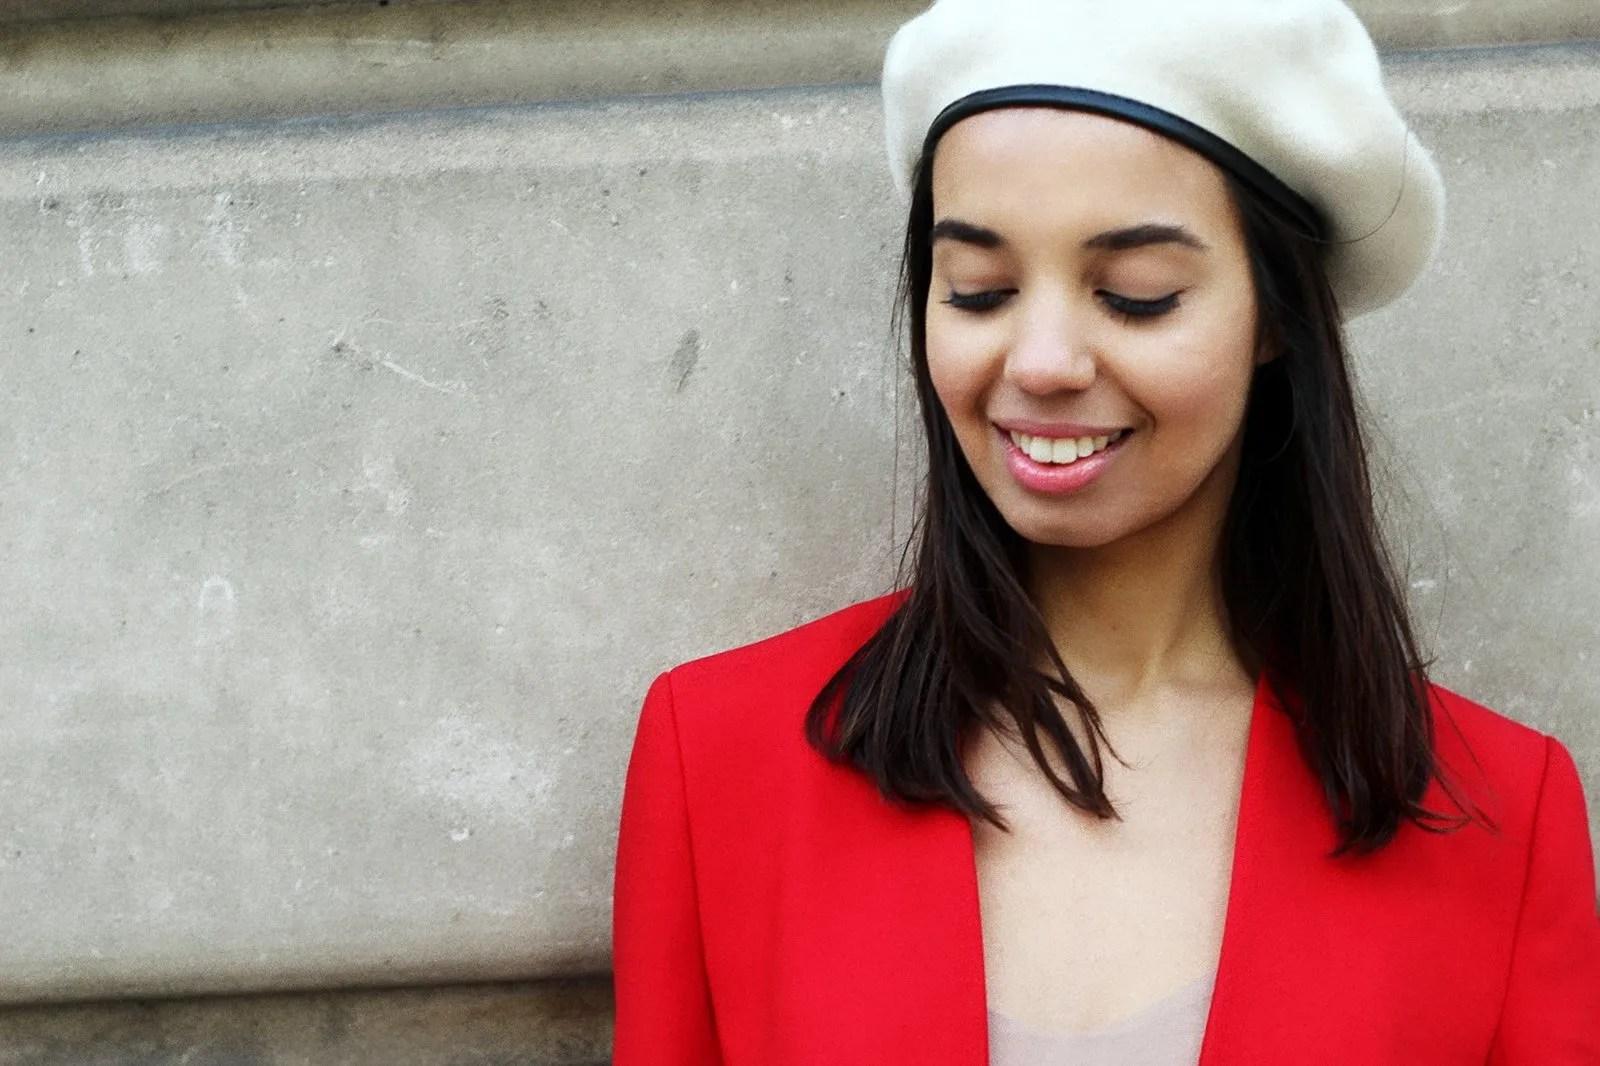 Beret Minimalist Wardrobe - The Style of Laura Jane